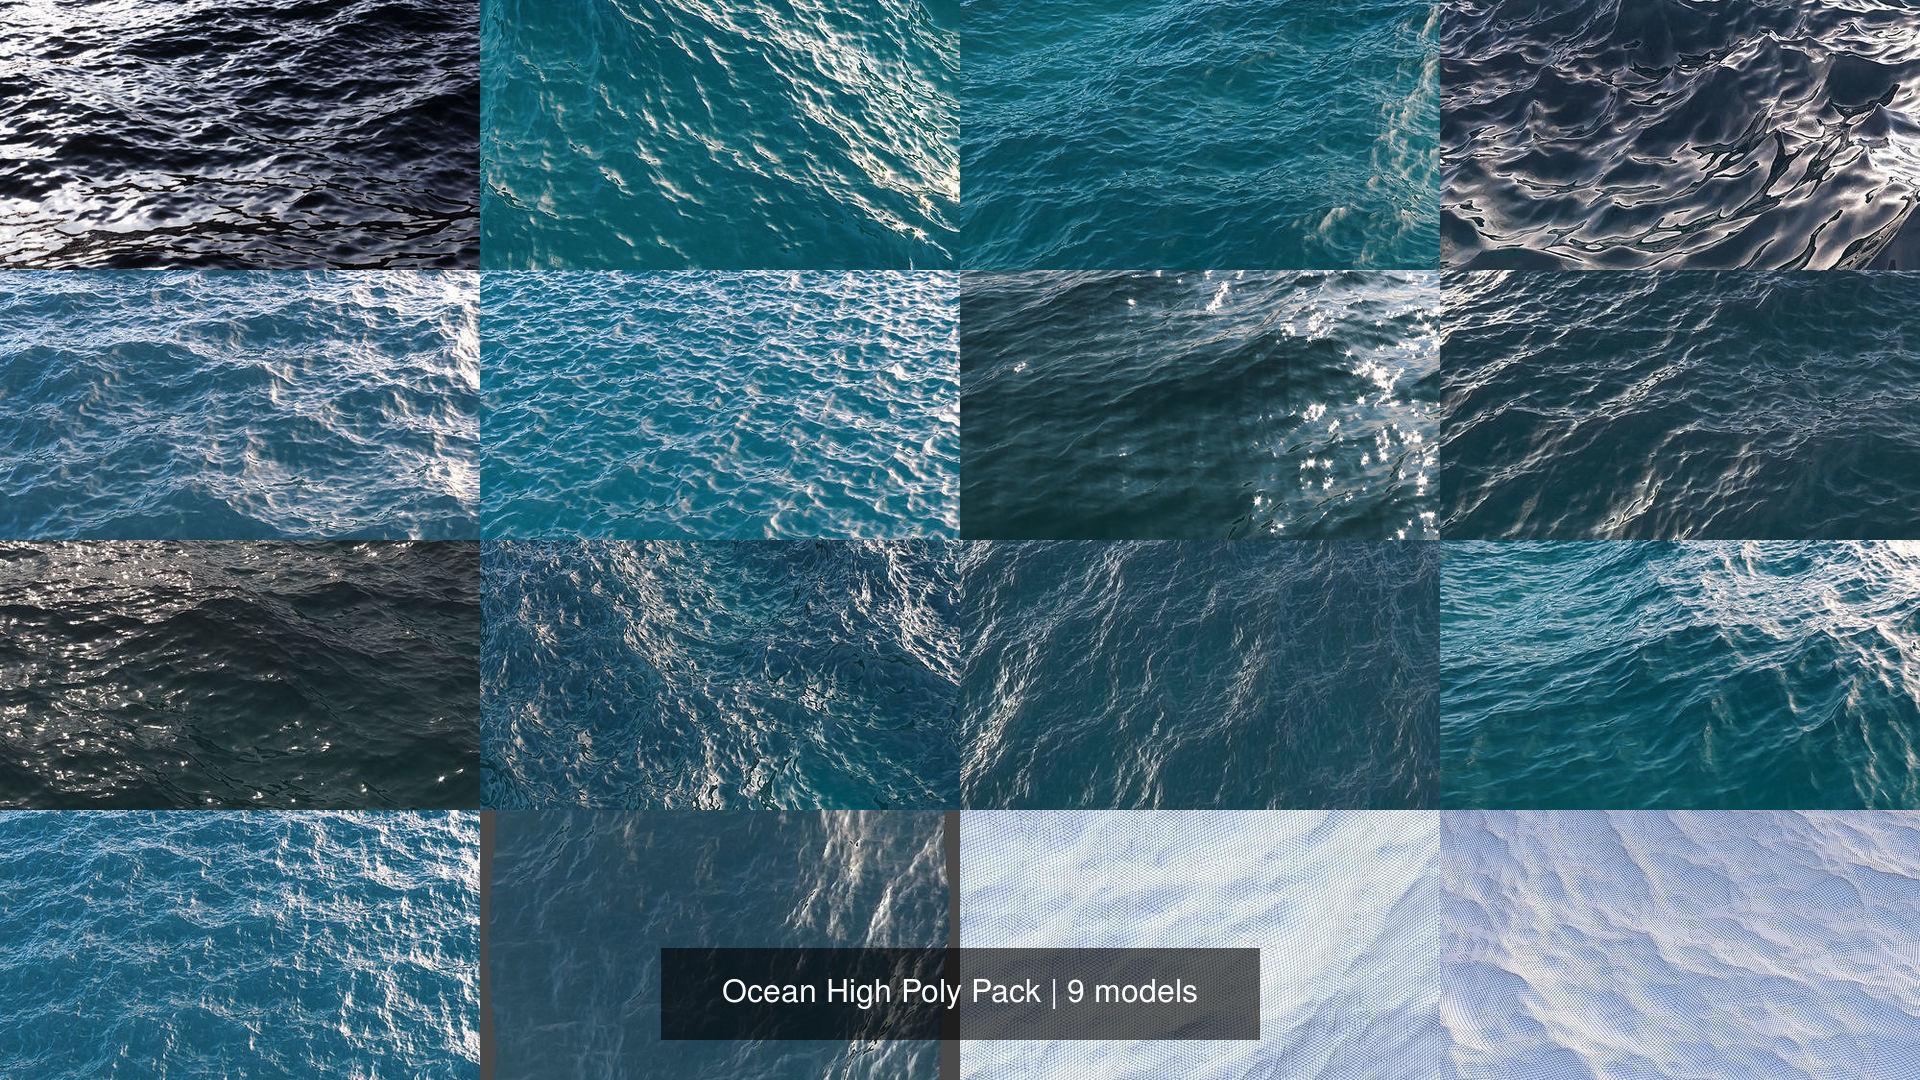 Ocean High Poly Pack